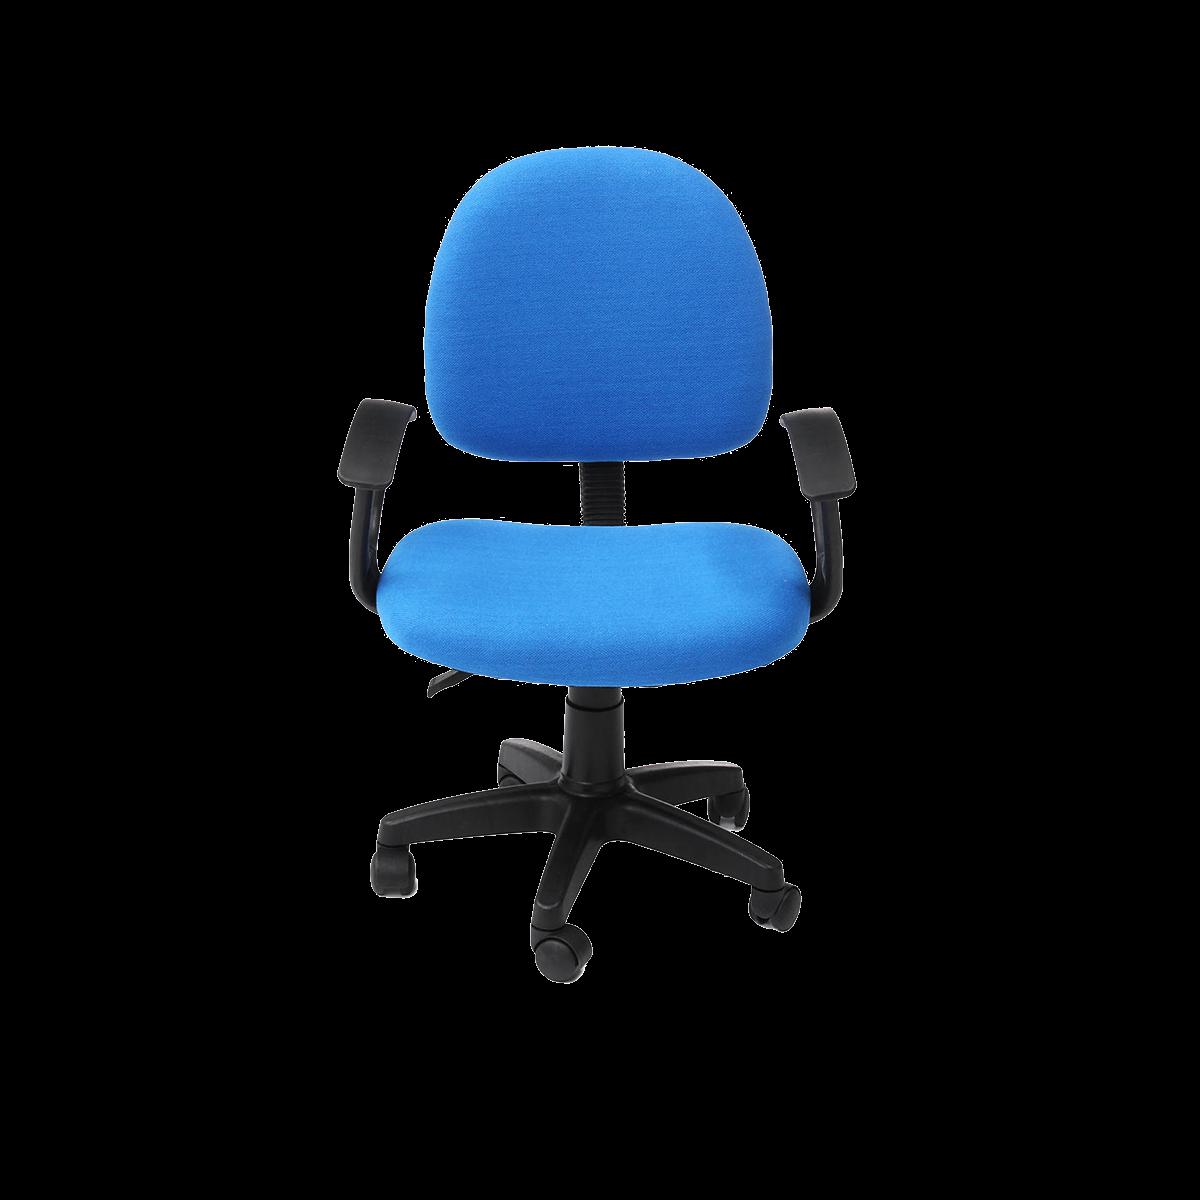 Rotary chairs